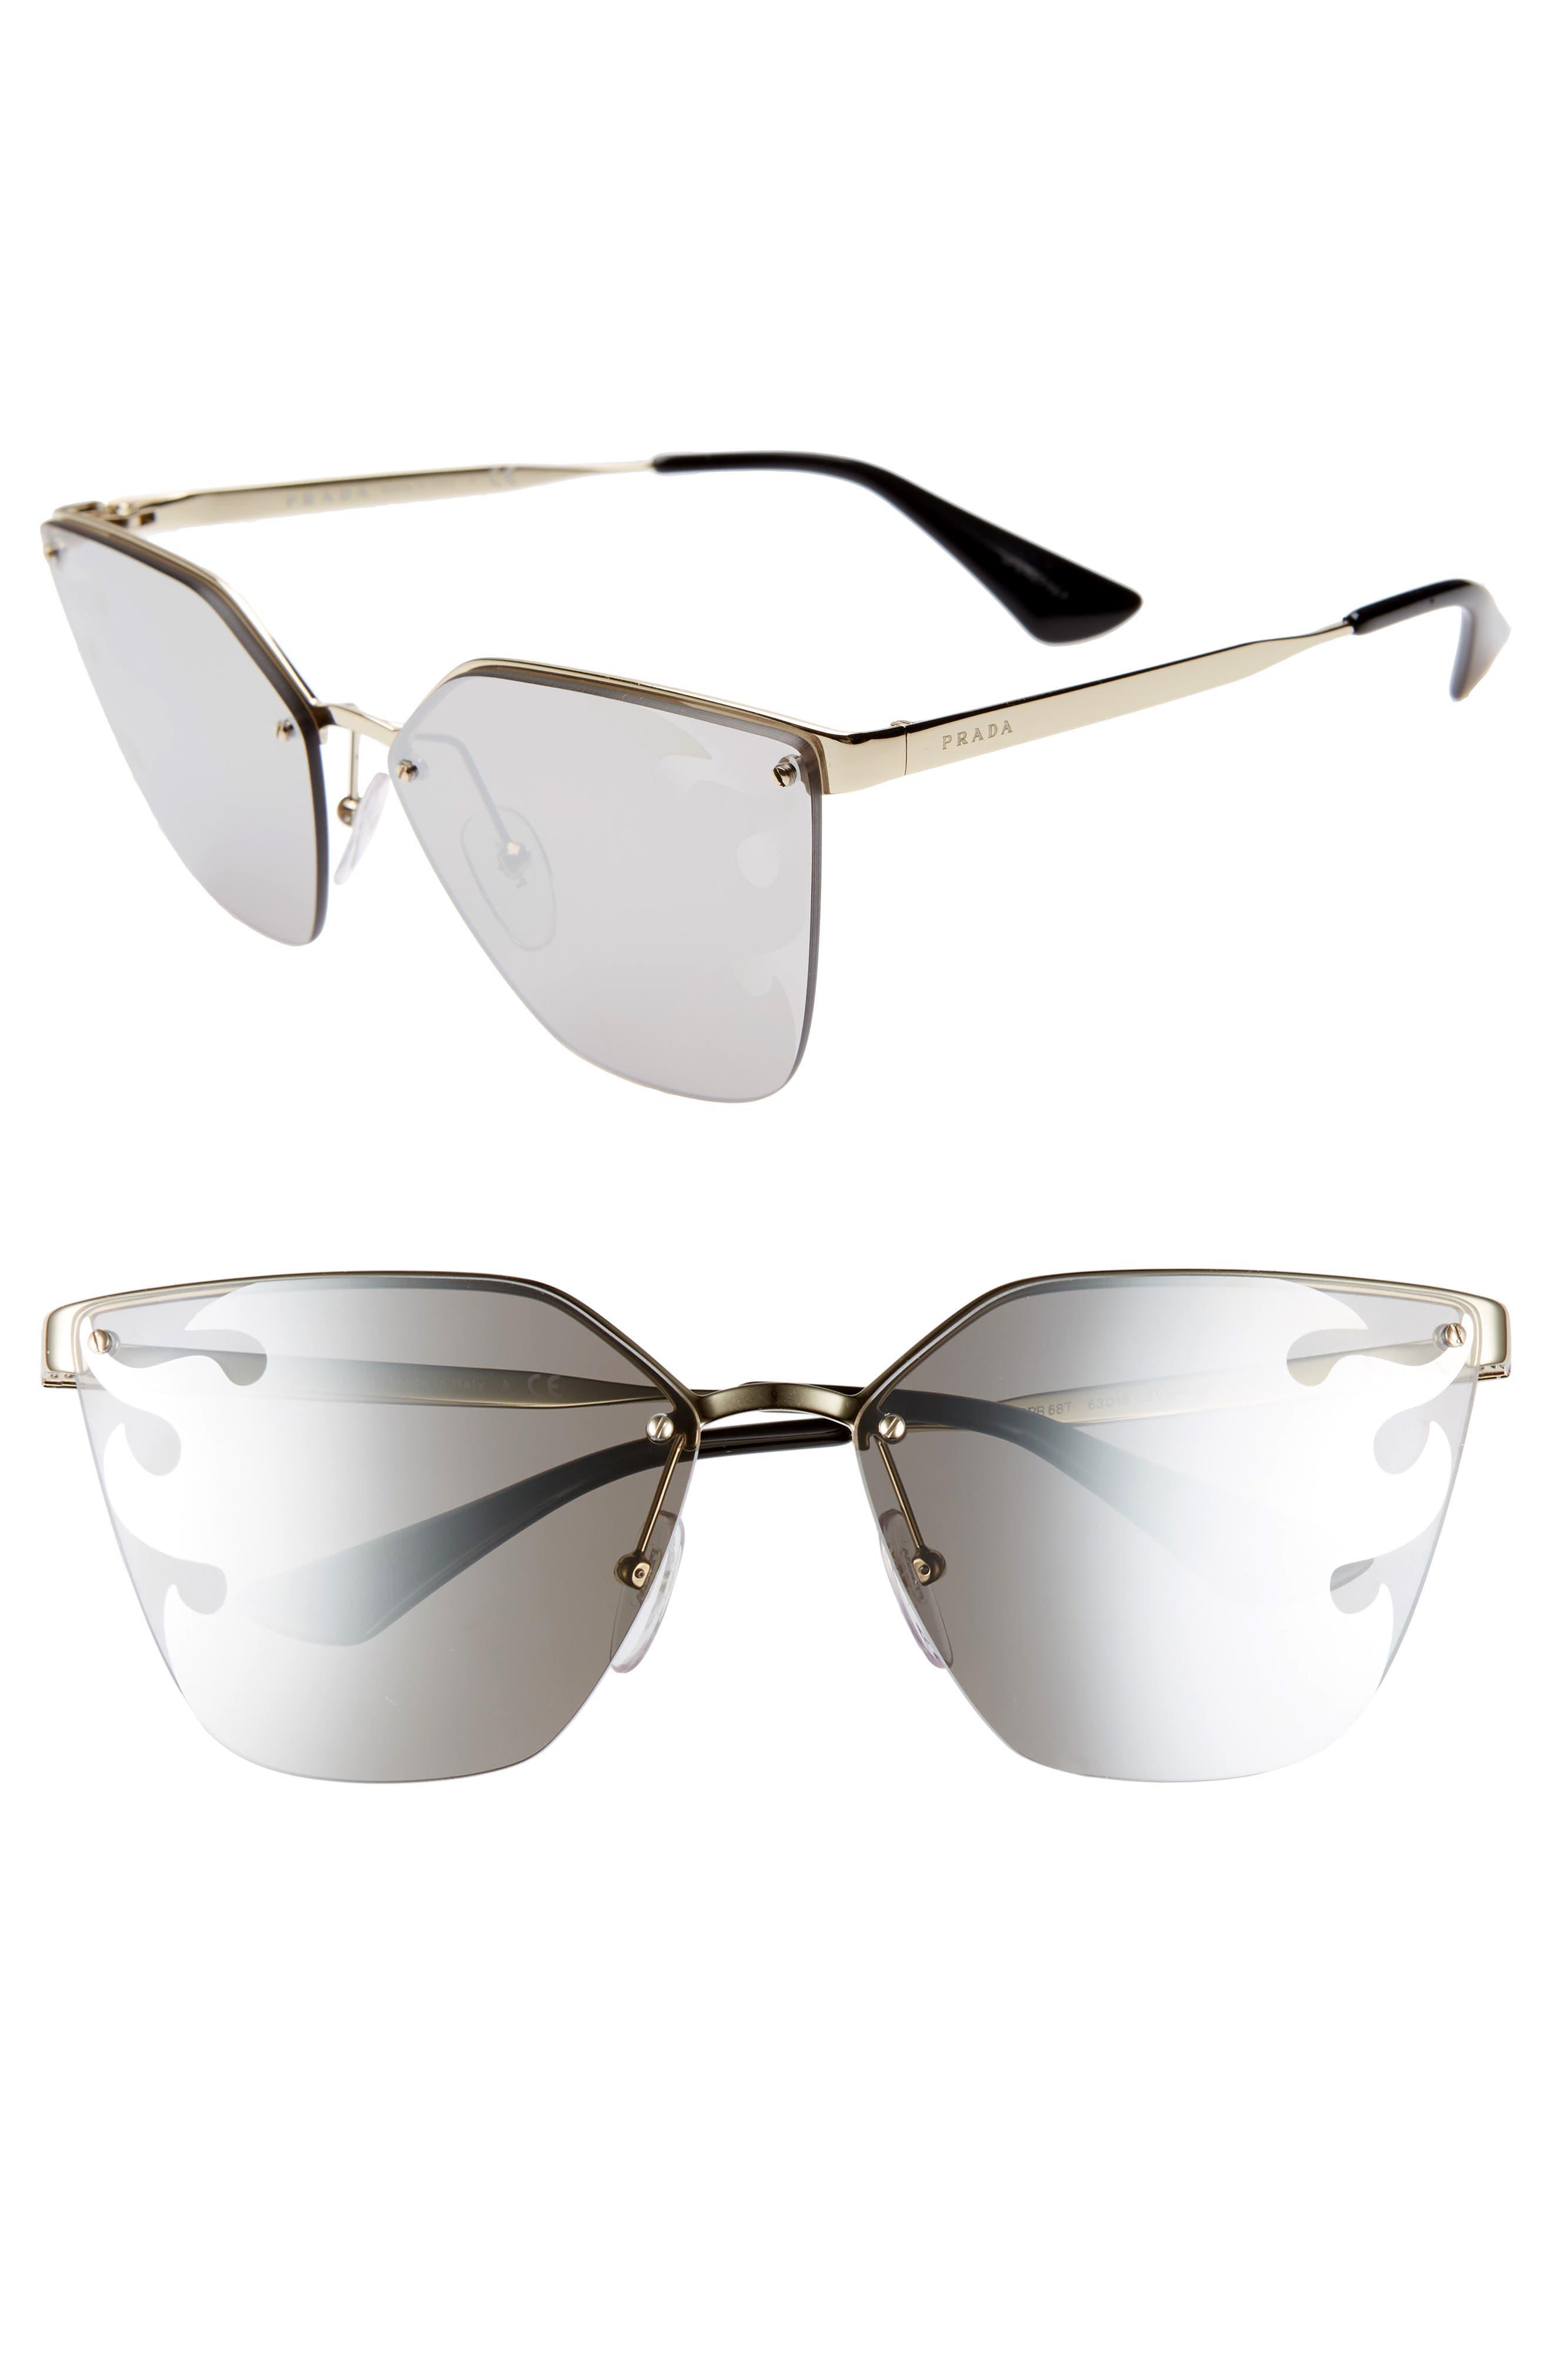 PRADA,                             Cinéma 63mm Oversize Rimless Sunglasses,                             Main thumbnail 1, color,                             GOLD/ GREY SILVER MIRROR